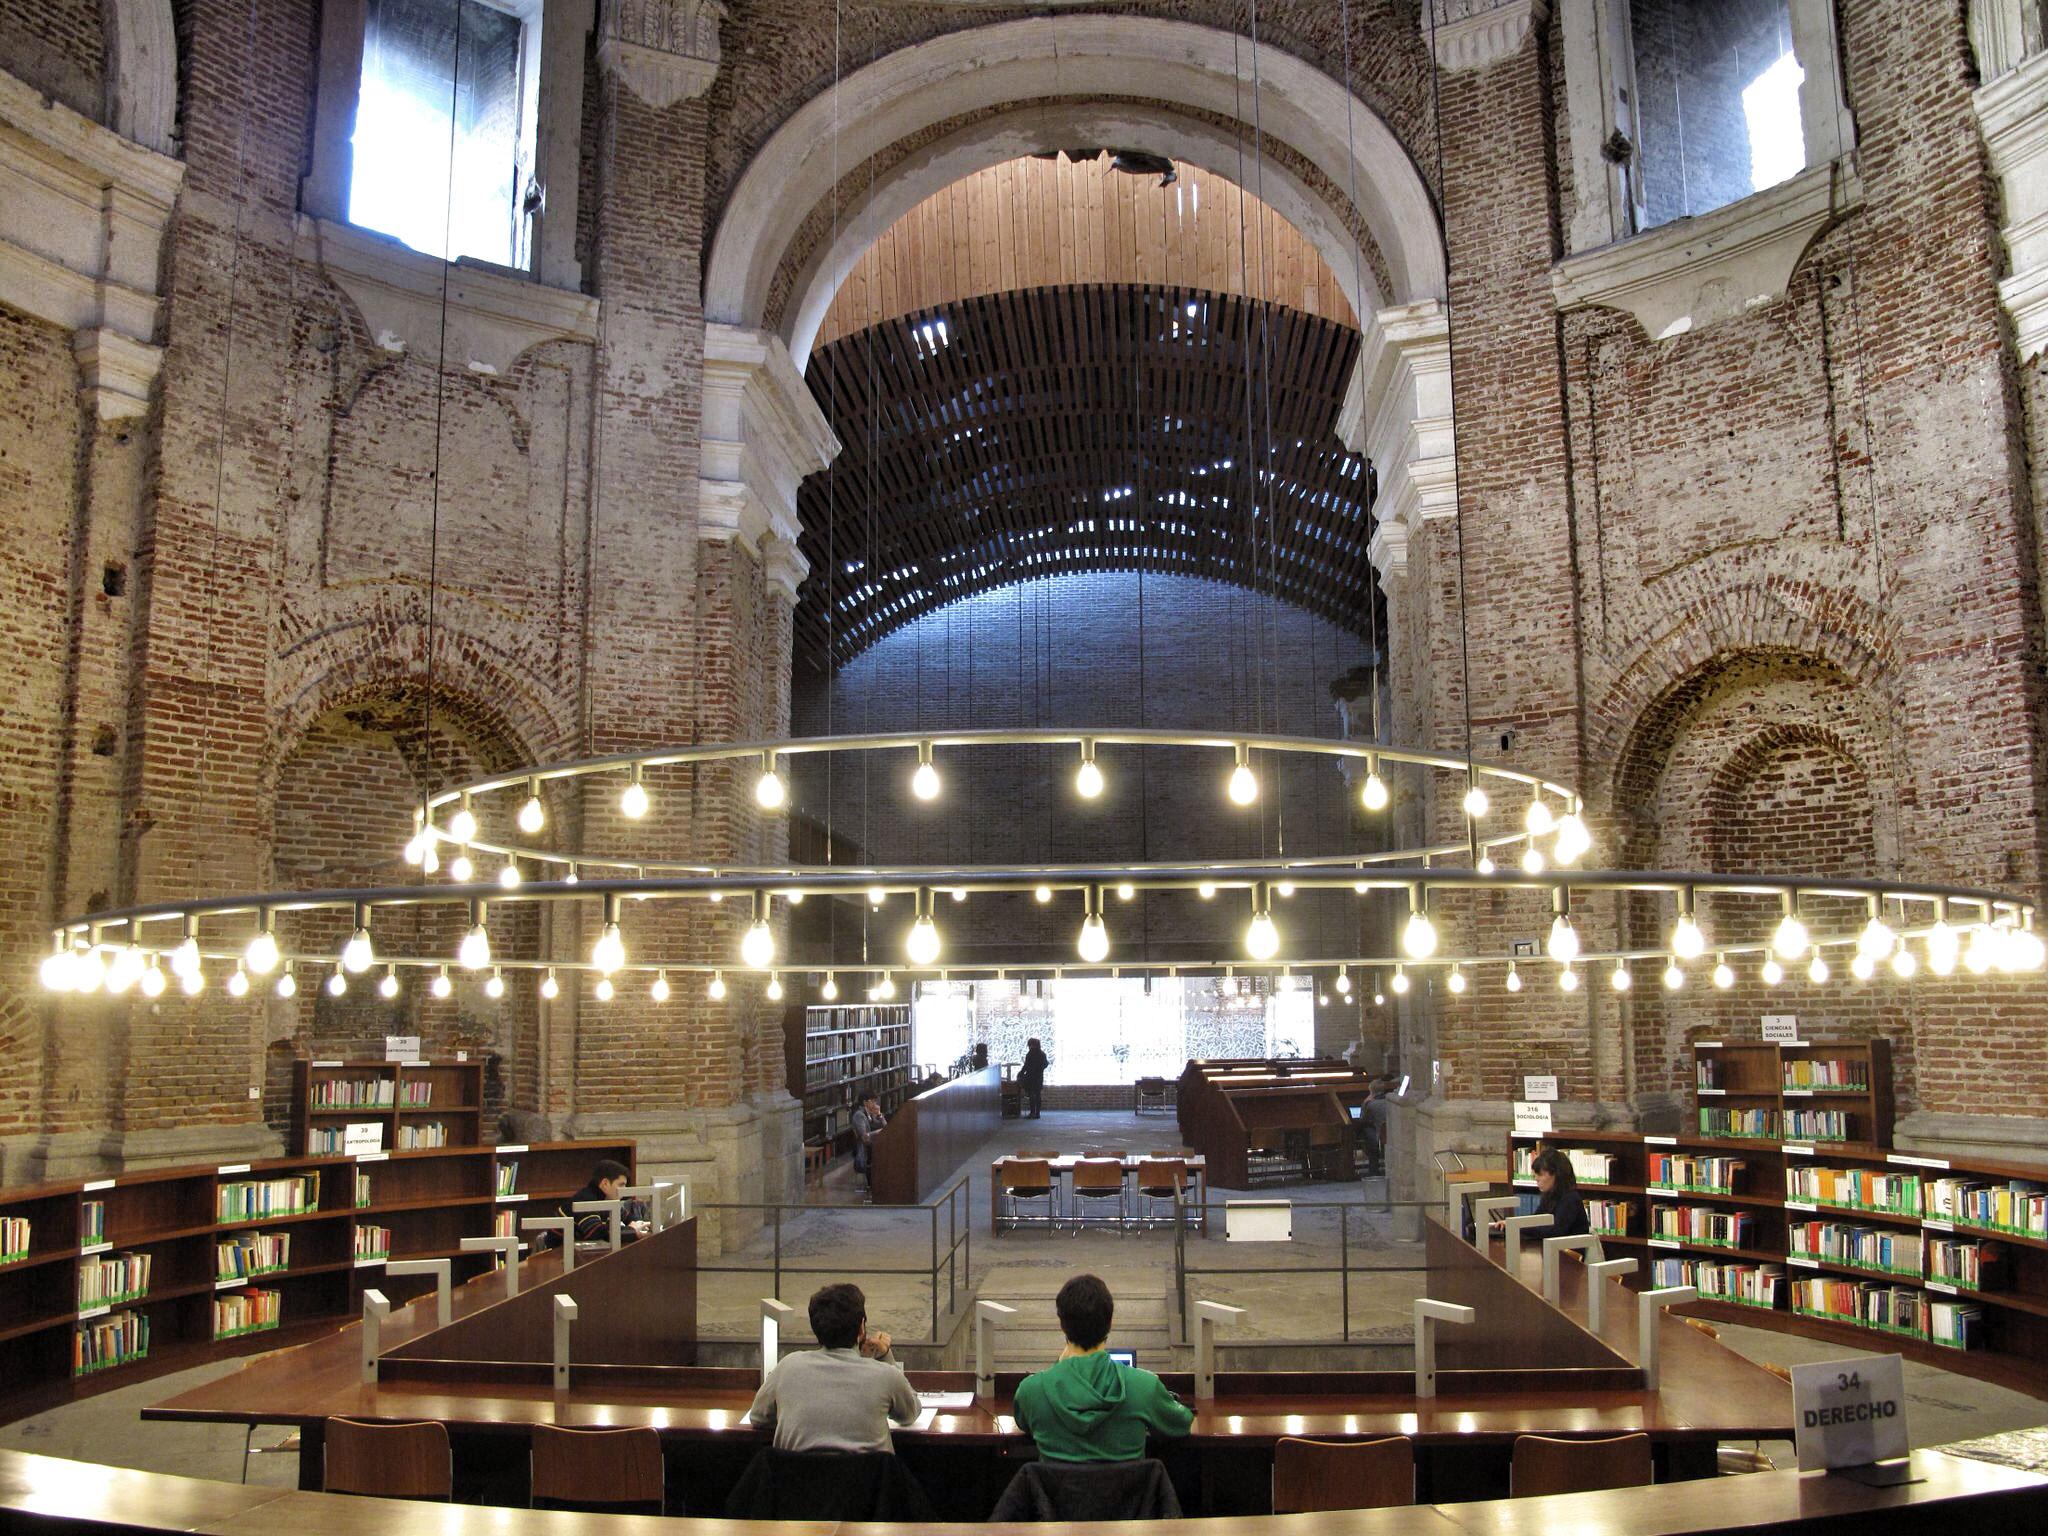 Escuelas p as de lavapi s intervenci n patrimonial ejemplar for Biblioteca uned